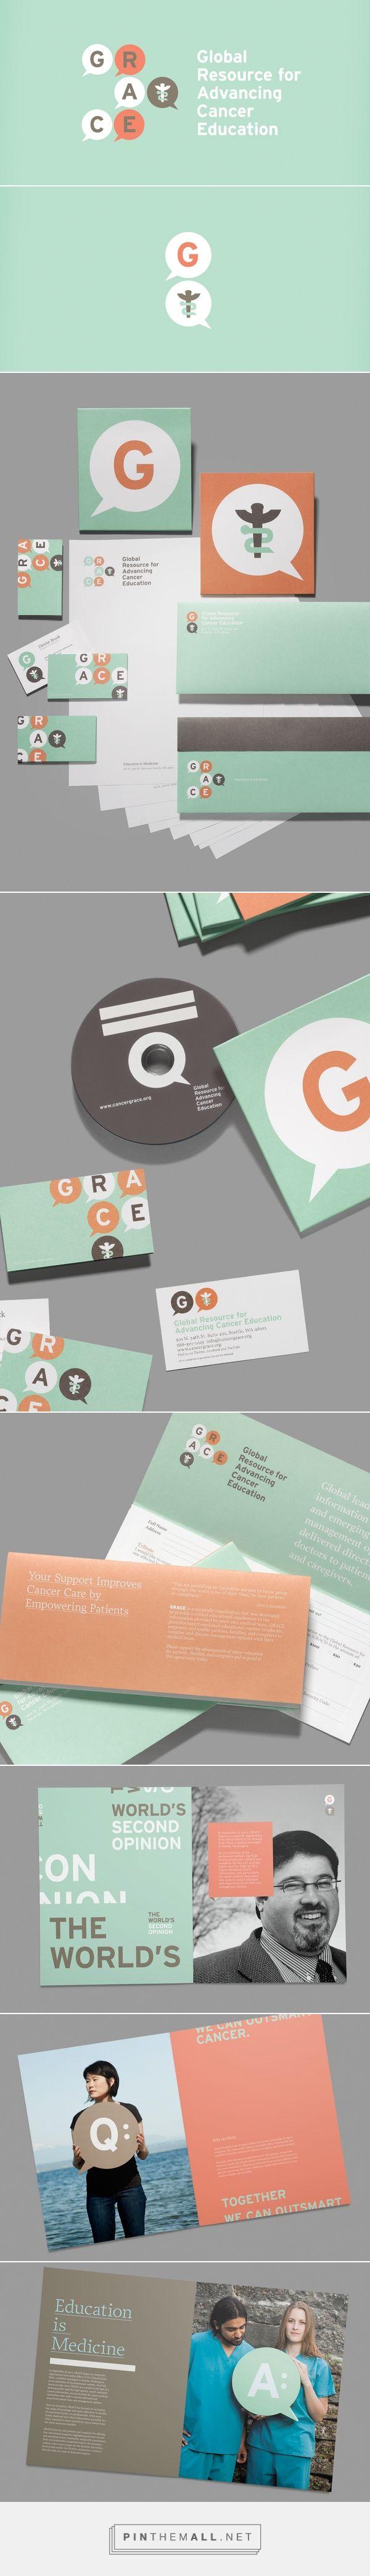 Global Resource for Advancing Cancer Education Branding on Behance | Fivestar Branding – Design and Branding Agency & Inspiration Gallery | Professional Logo and Website Design